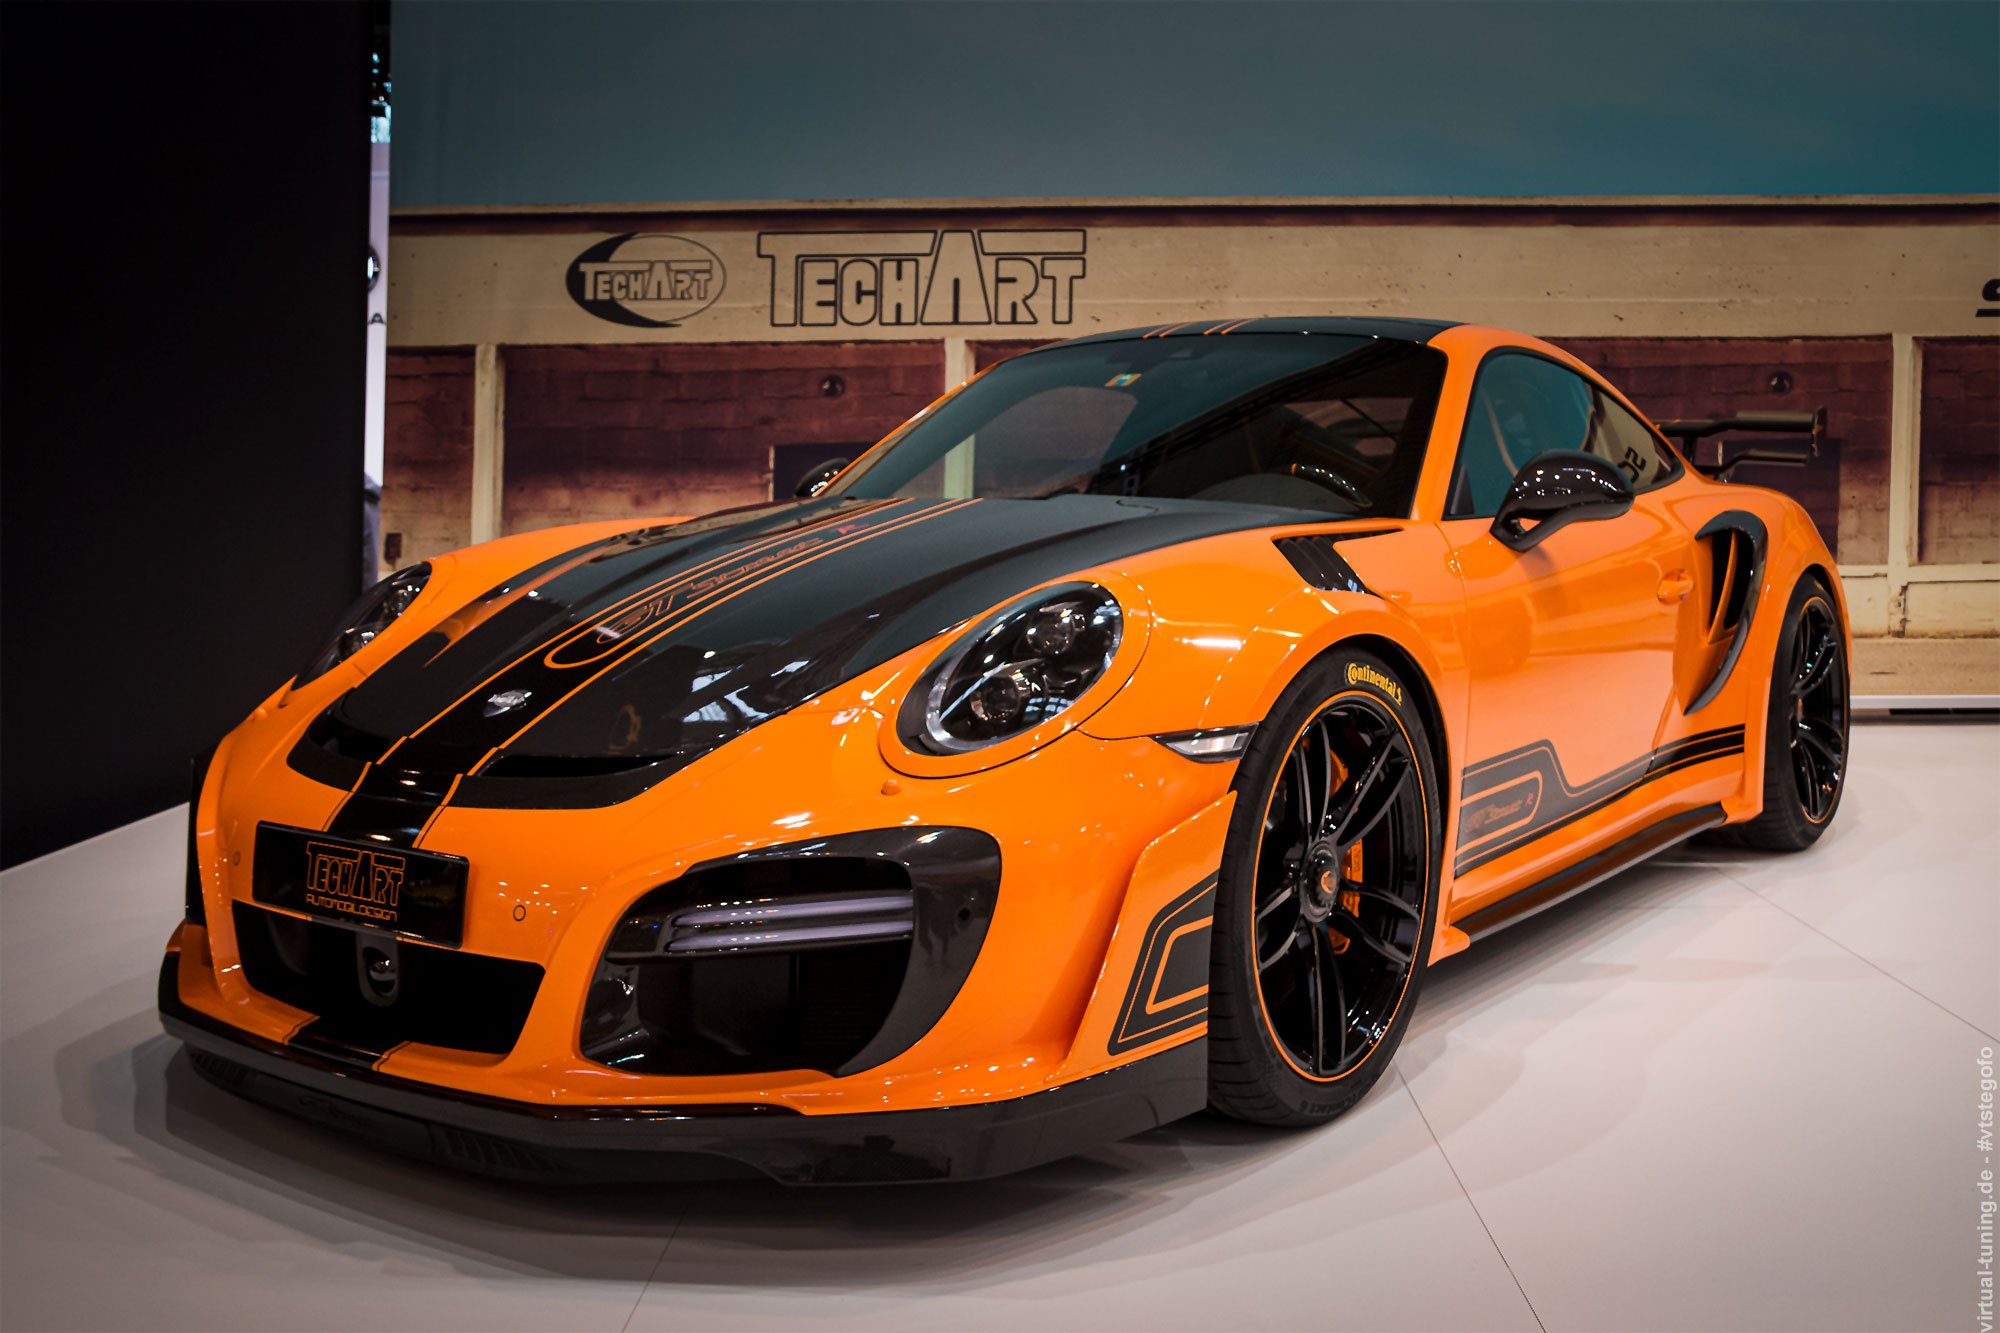 Techart GTstreet R (Porsche 911 Turbo S) - Essen Motor Show 2018